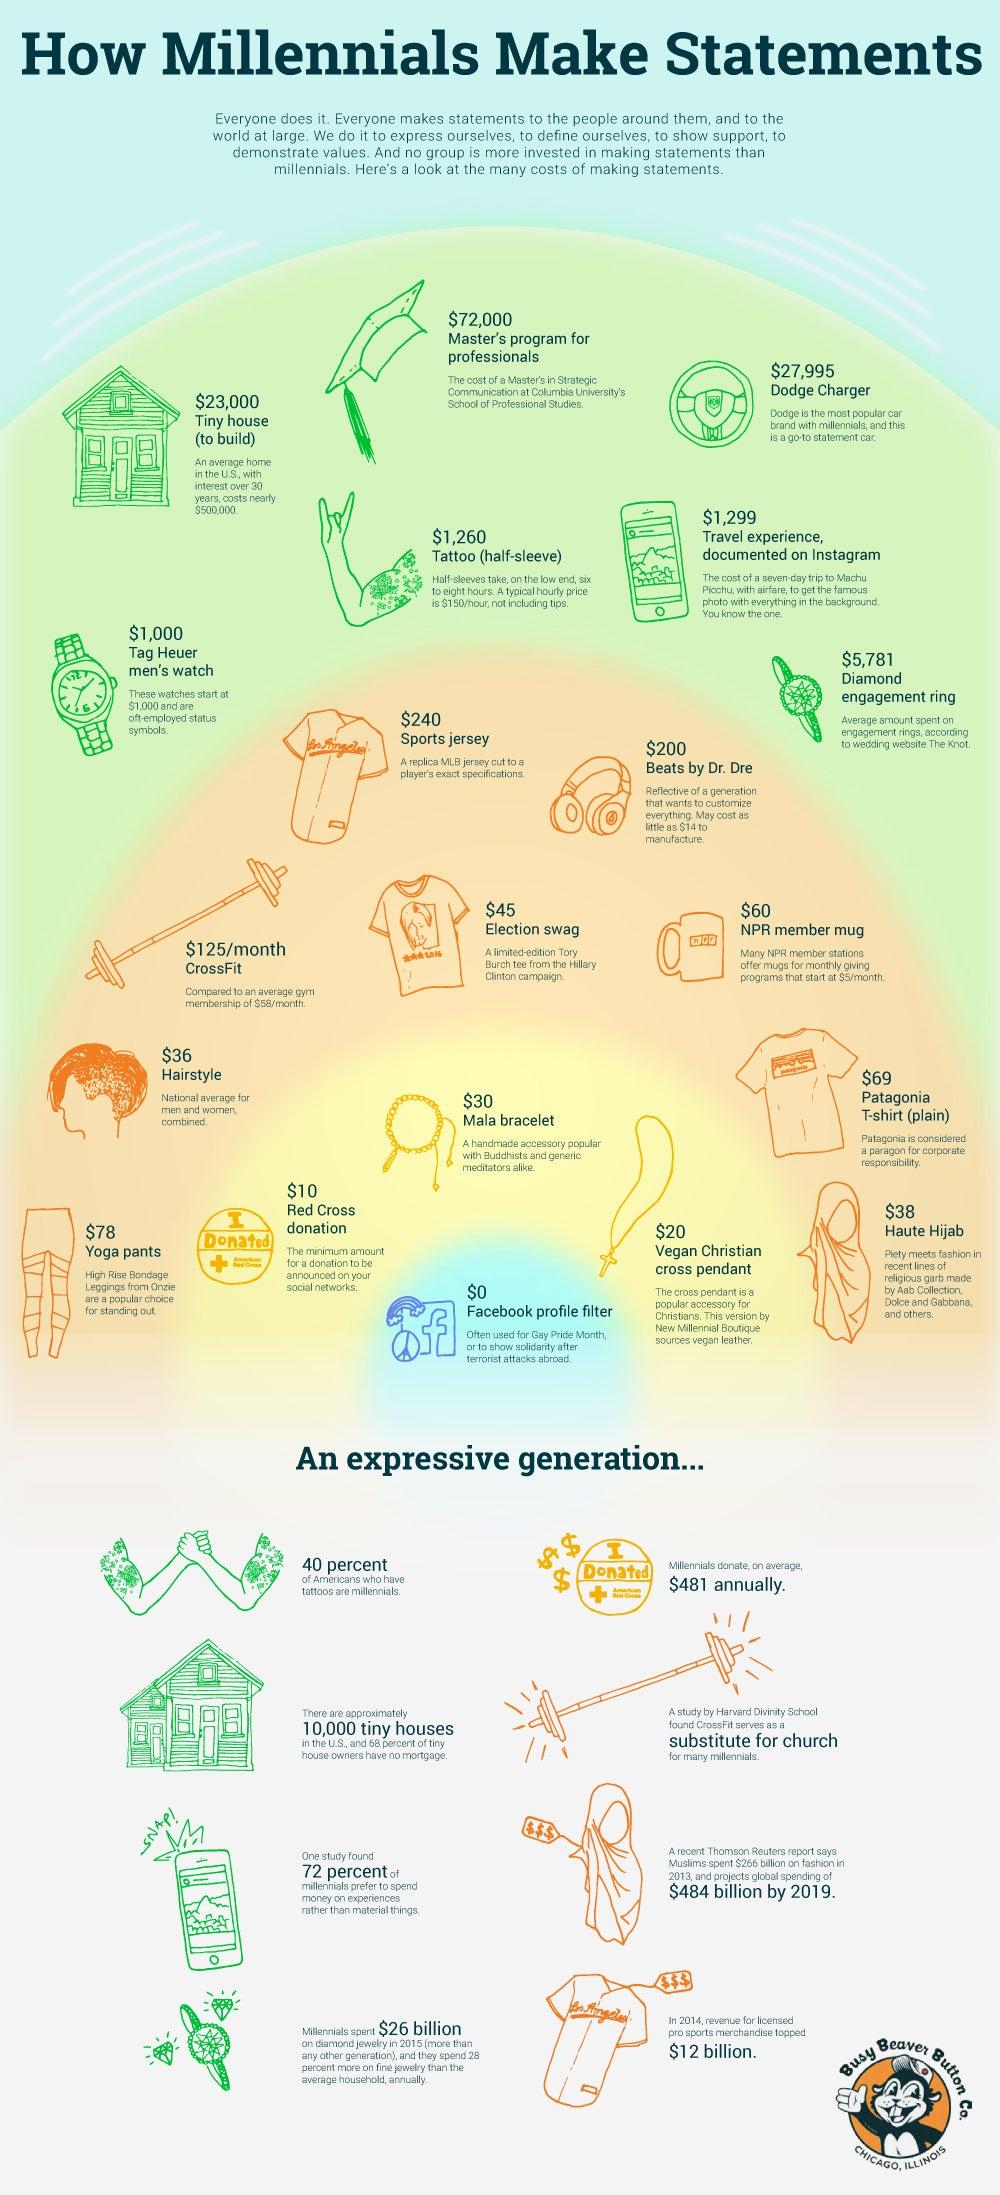 How Millennials Spend Their Money to Make Statements (Infographic)